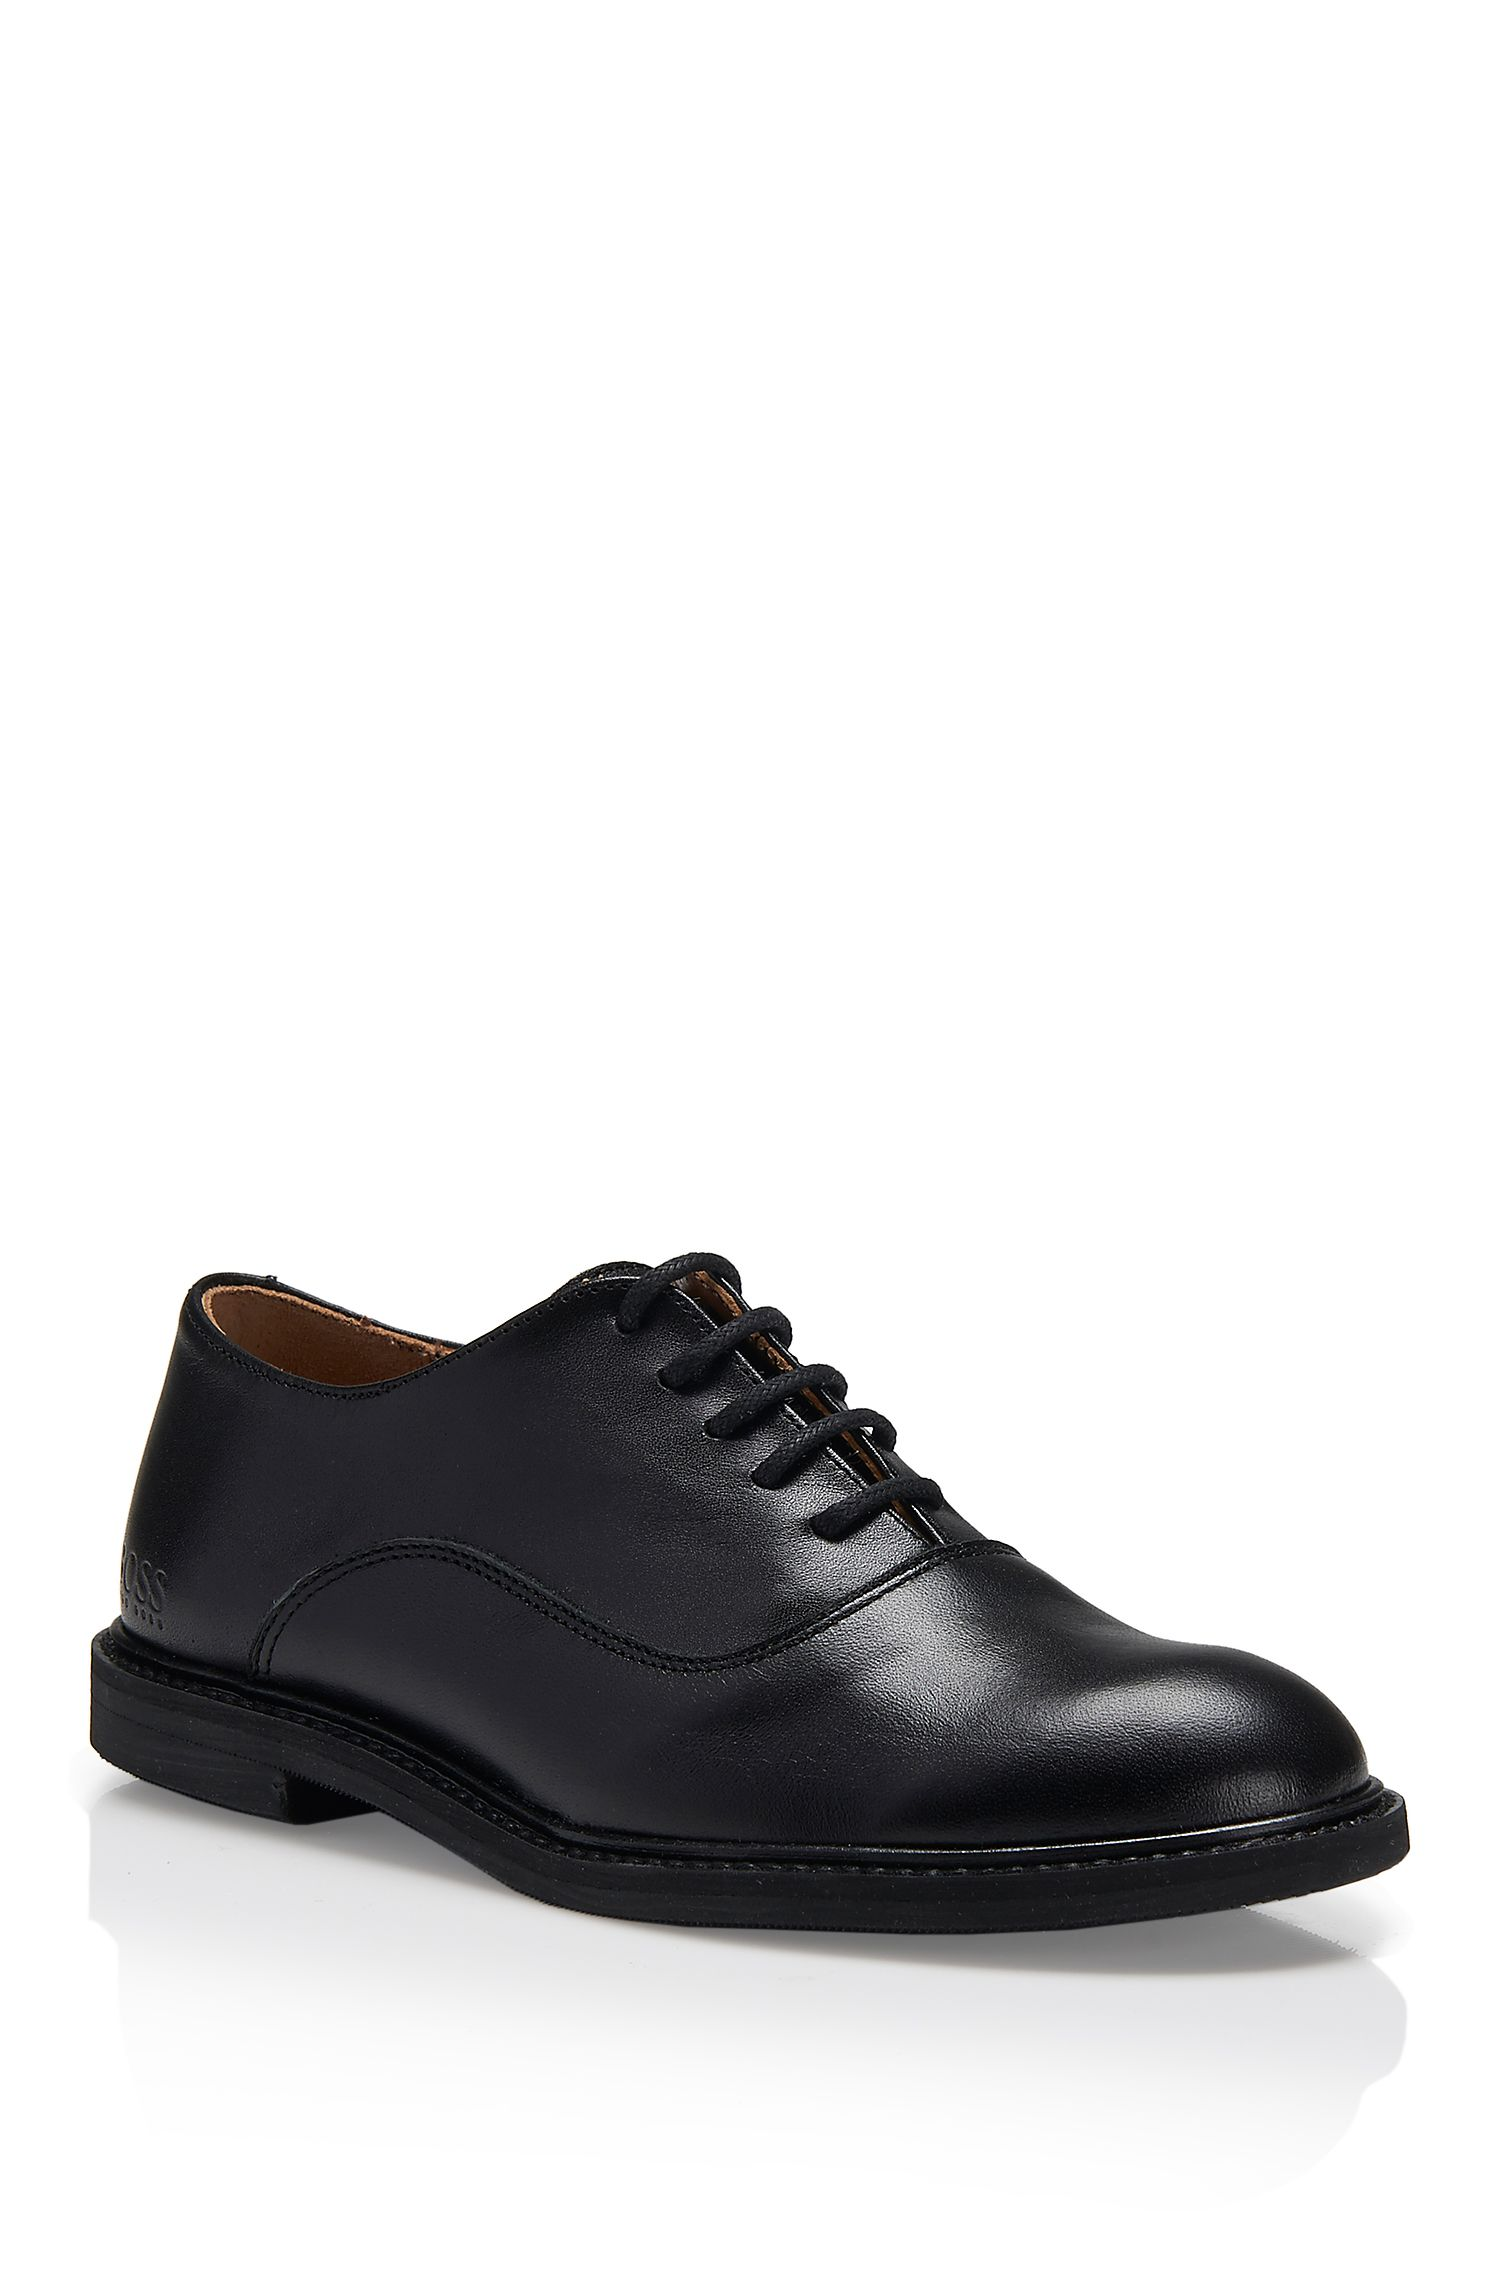 'J29097' | Boys Leather Derby Shoes